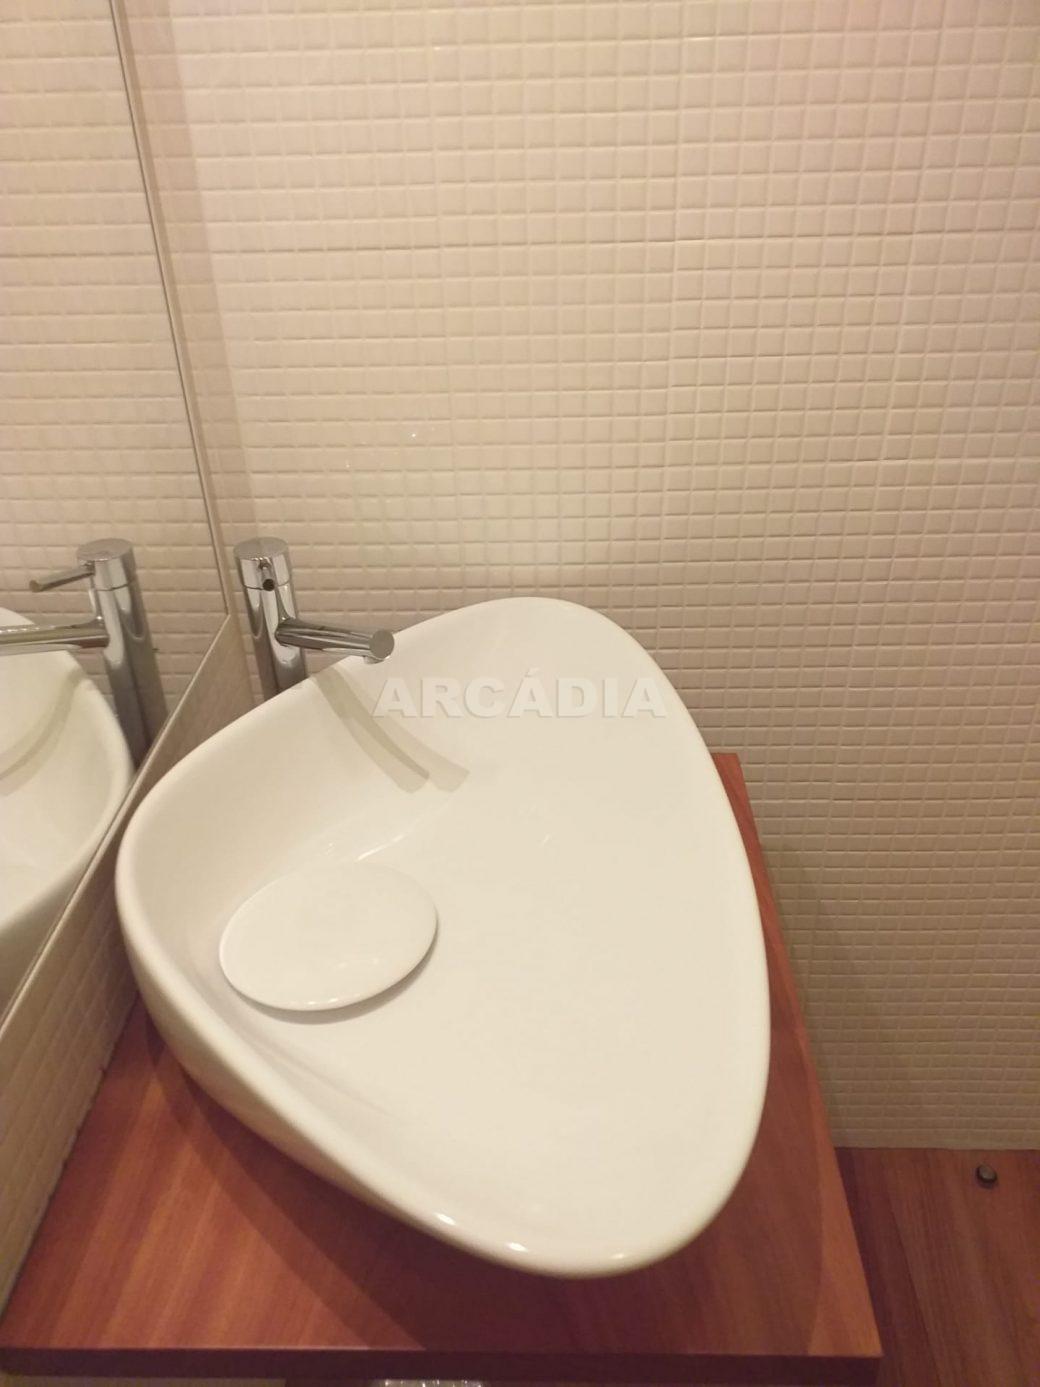 arcadia-imobiliaria-braga-apartamento-no-centro-historico-de-braga-tipo-2-para-compra-17